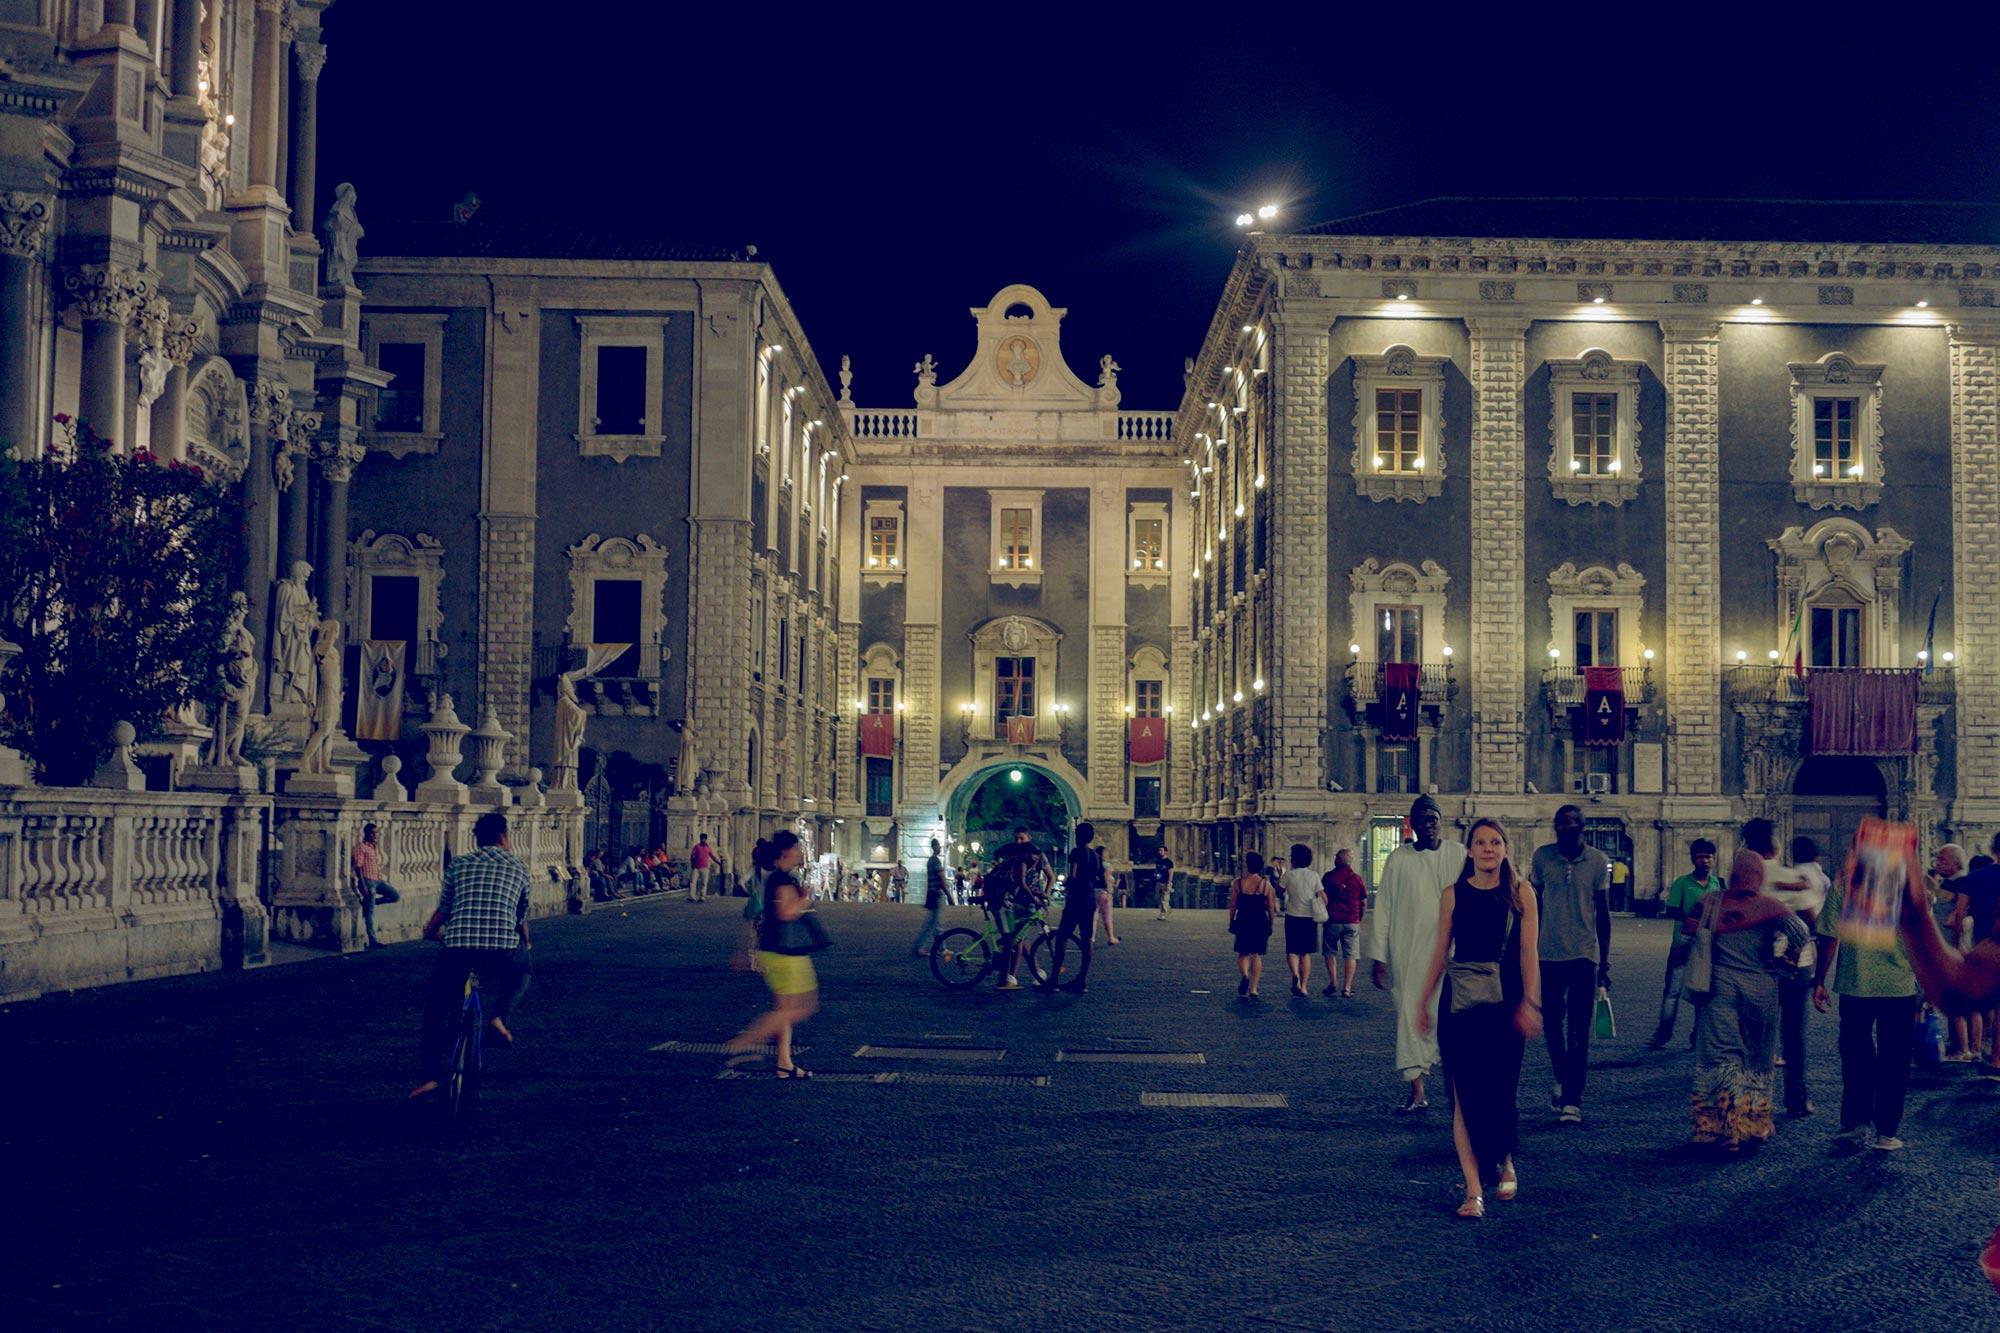 italy-sicilia-catania-piazza-duomo-night